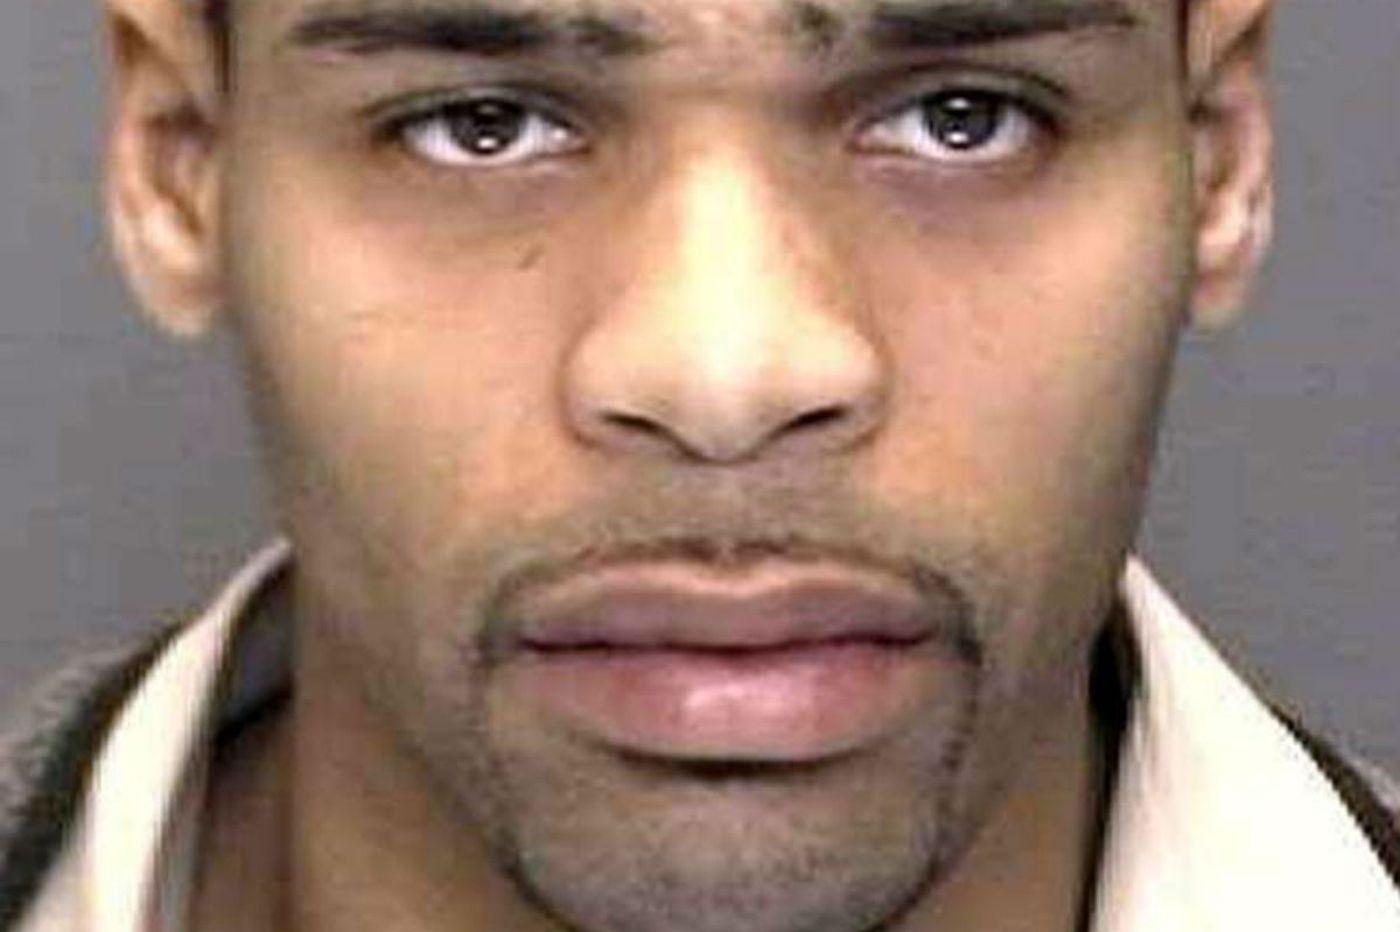 Pa. court reverses death sentence in gruesome murder